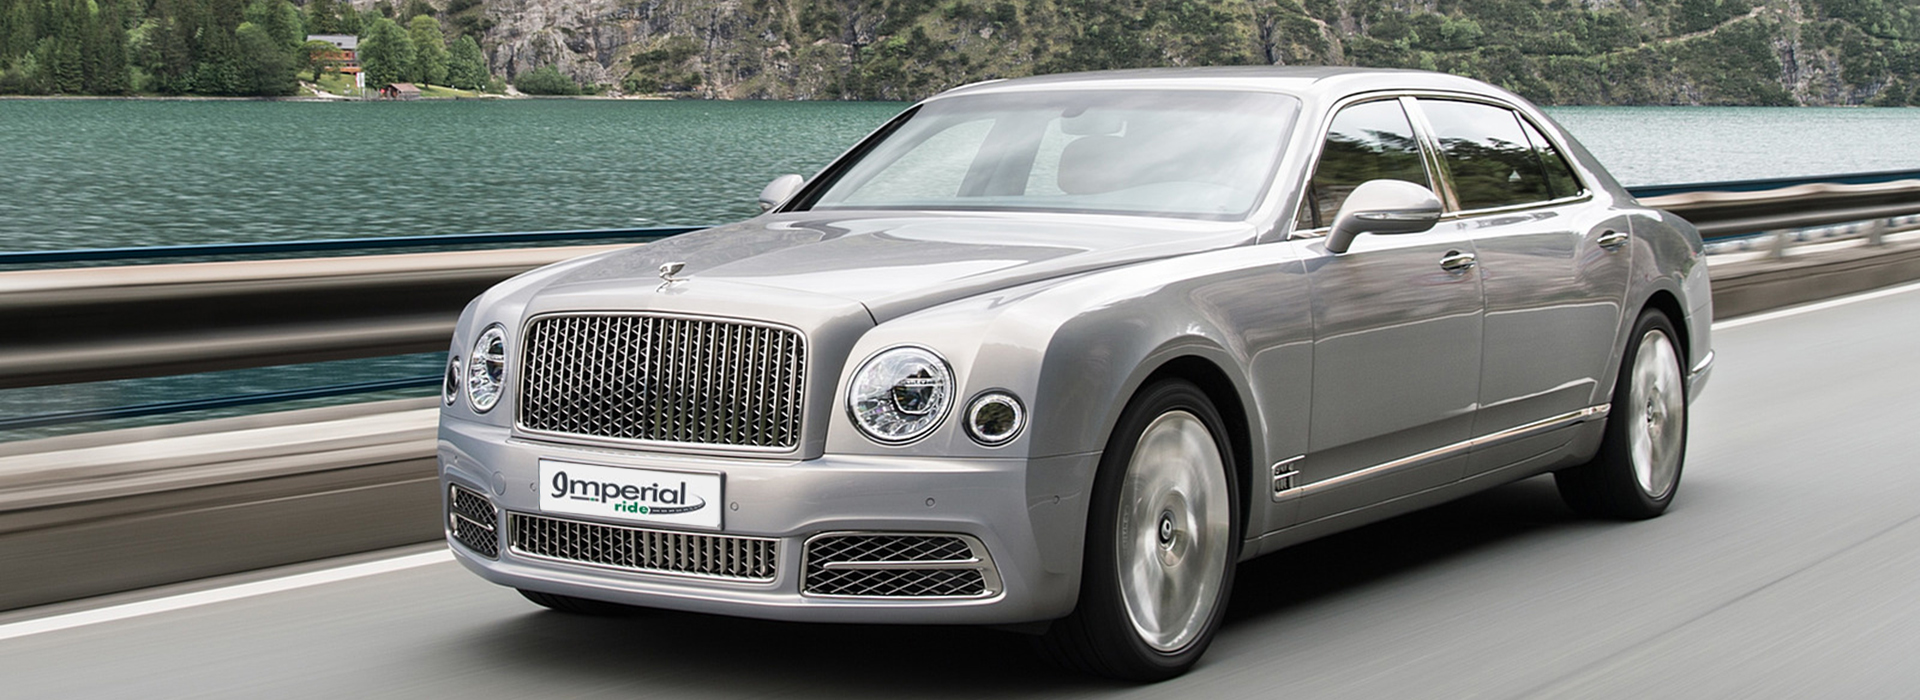 hire-Bentley-mulsanne